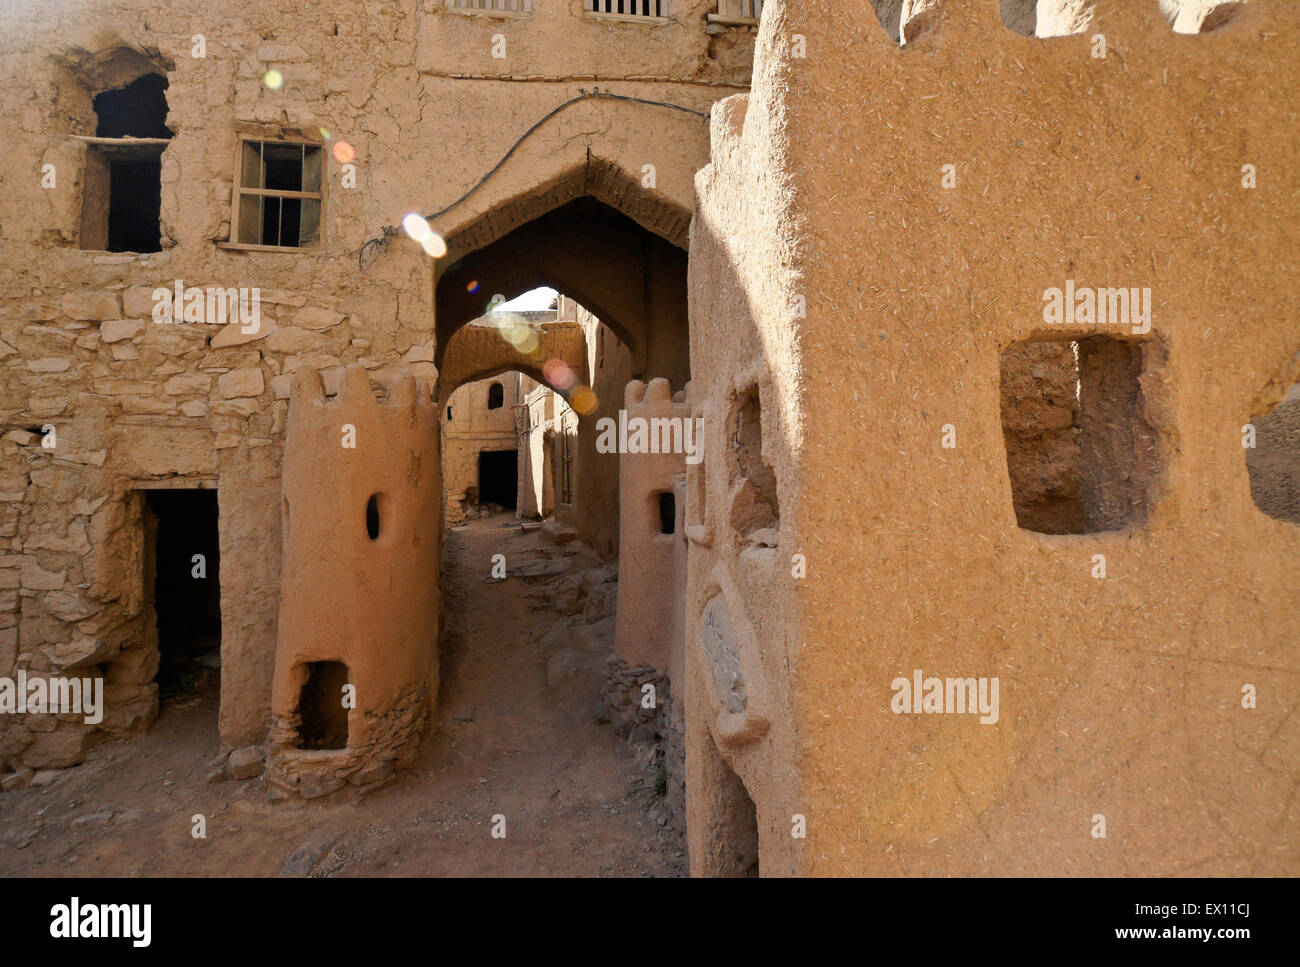 Ruins of mudbrick buildings in old section of Al-Hamra, Oman - Stock Image